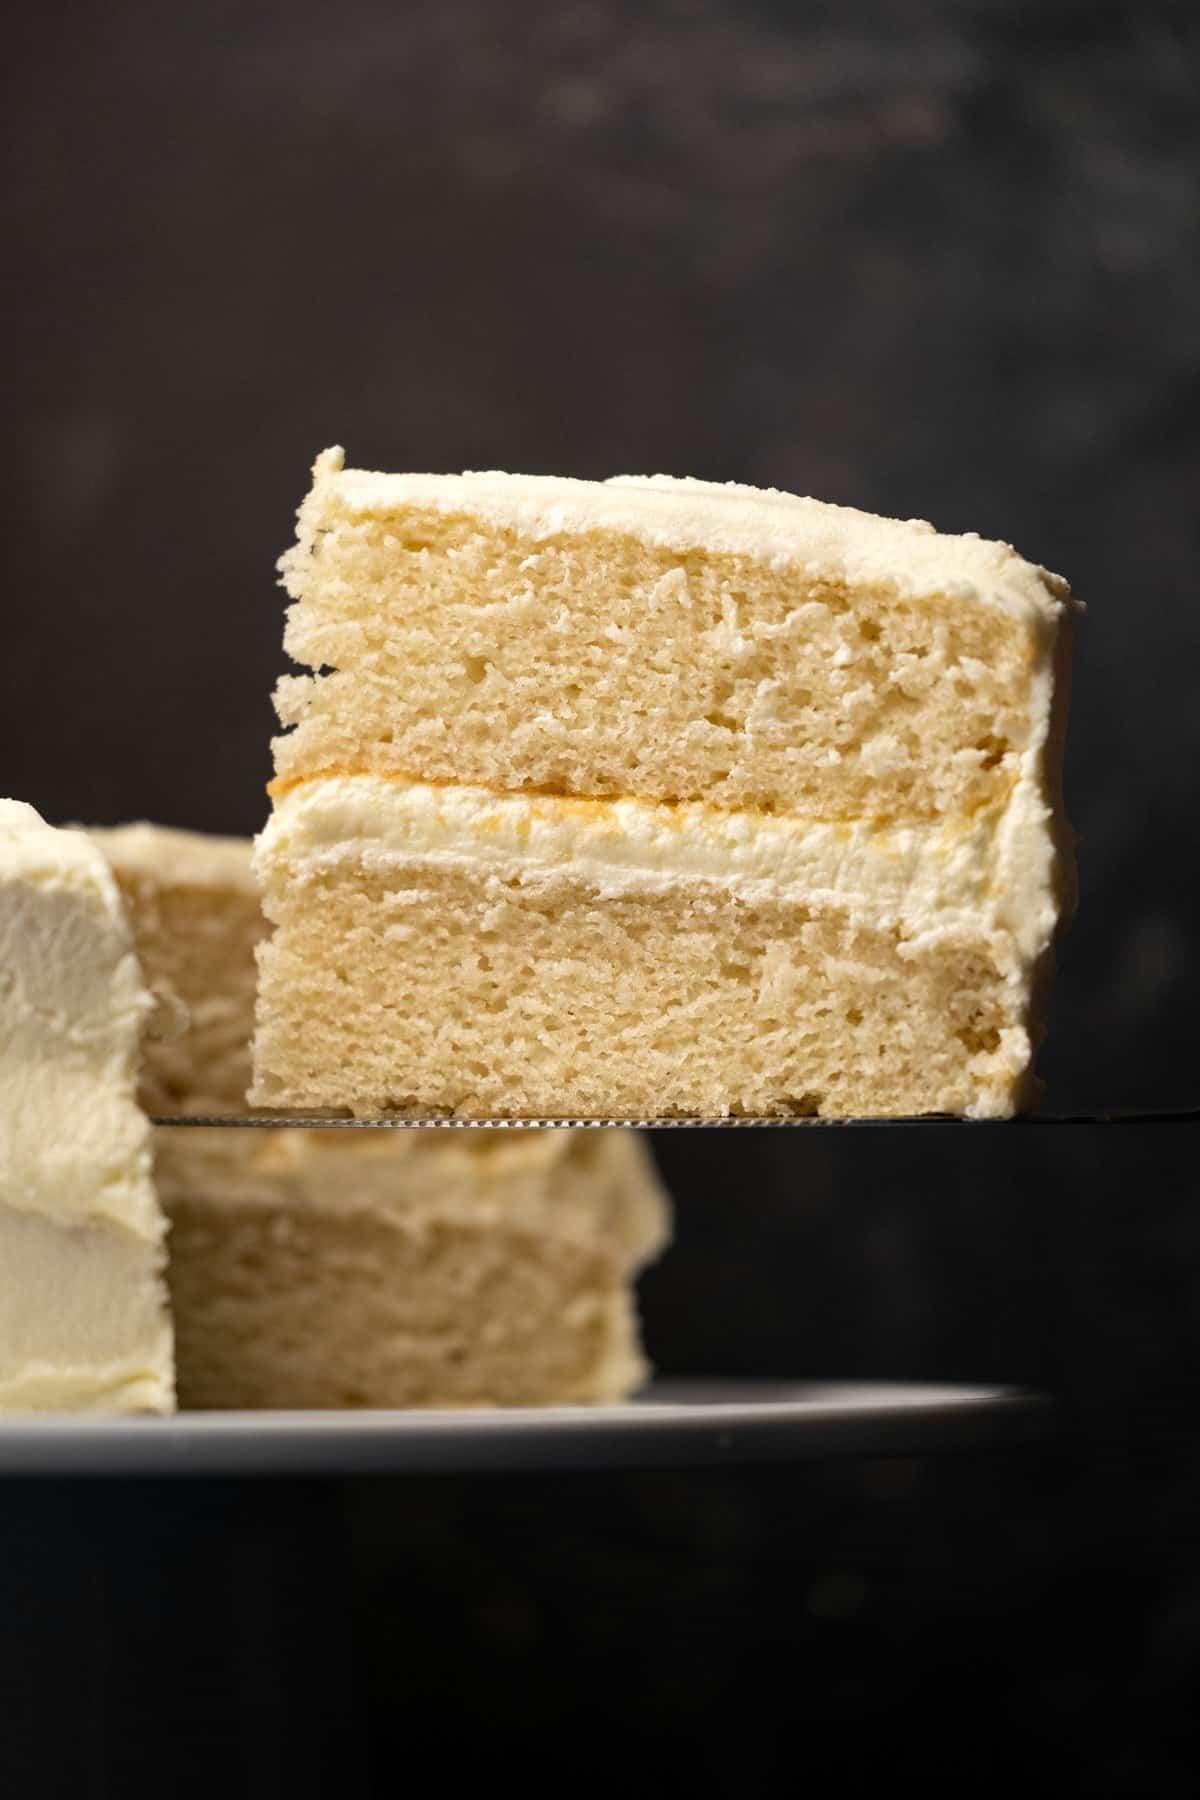 Slice of vegan white cake on a cake lifter.